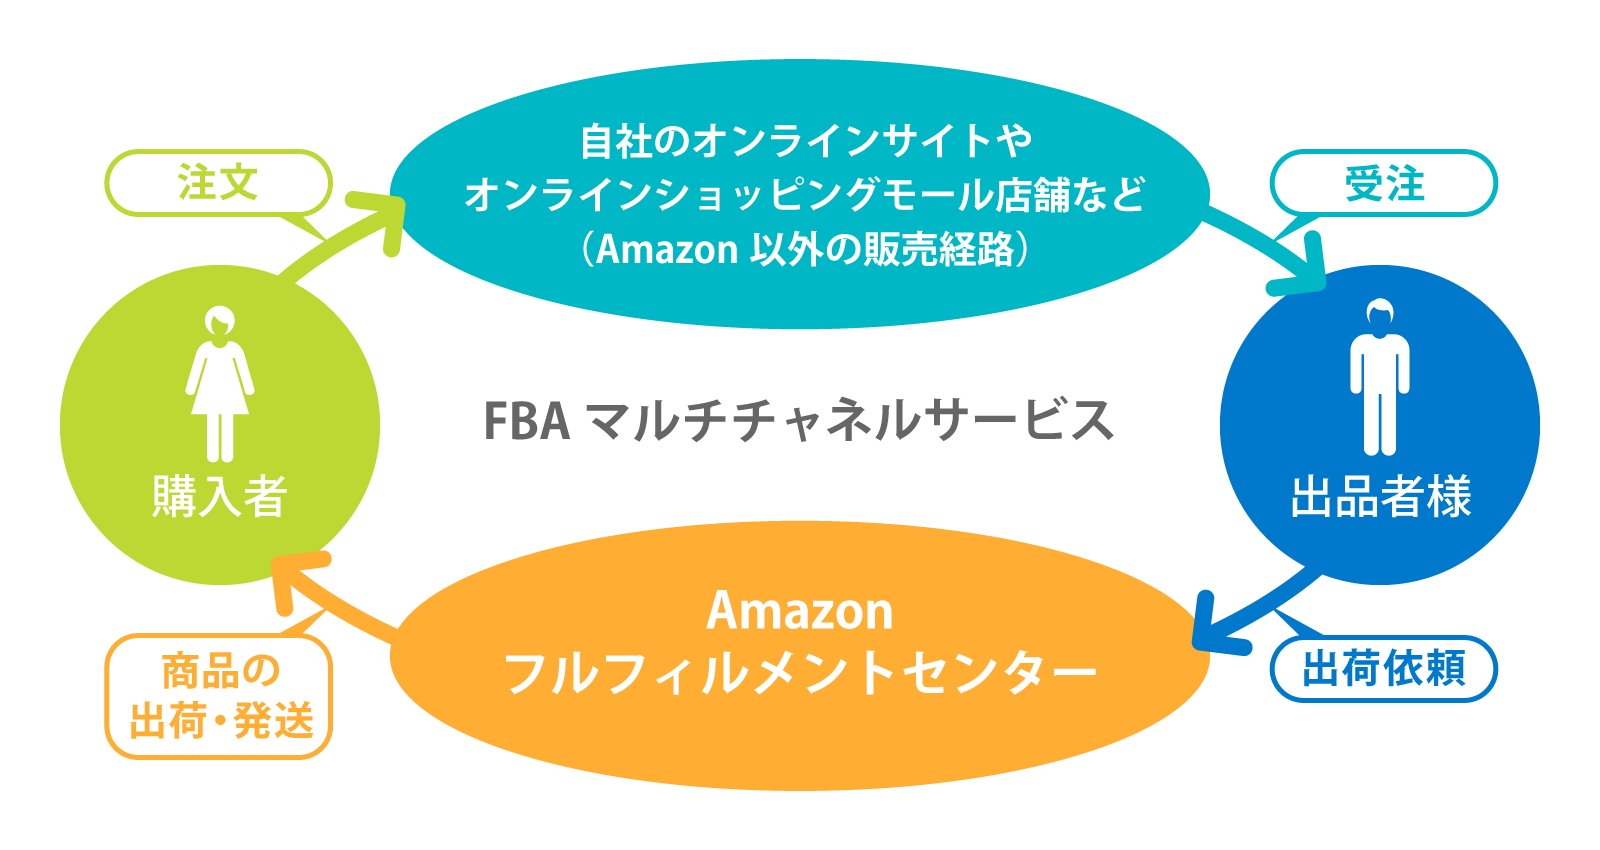 FBAマルチチャネルサービス